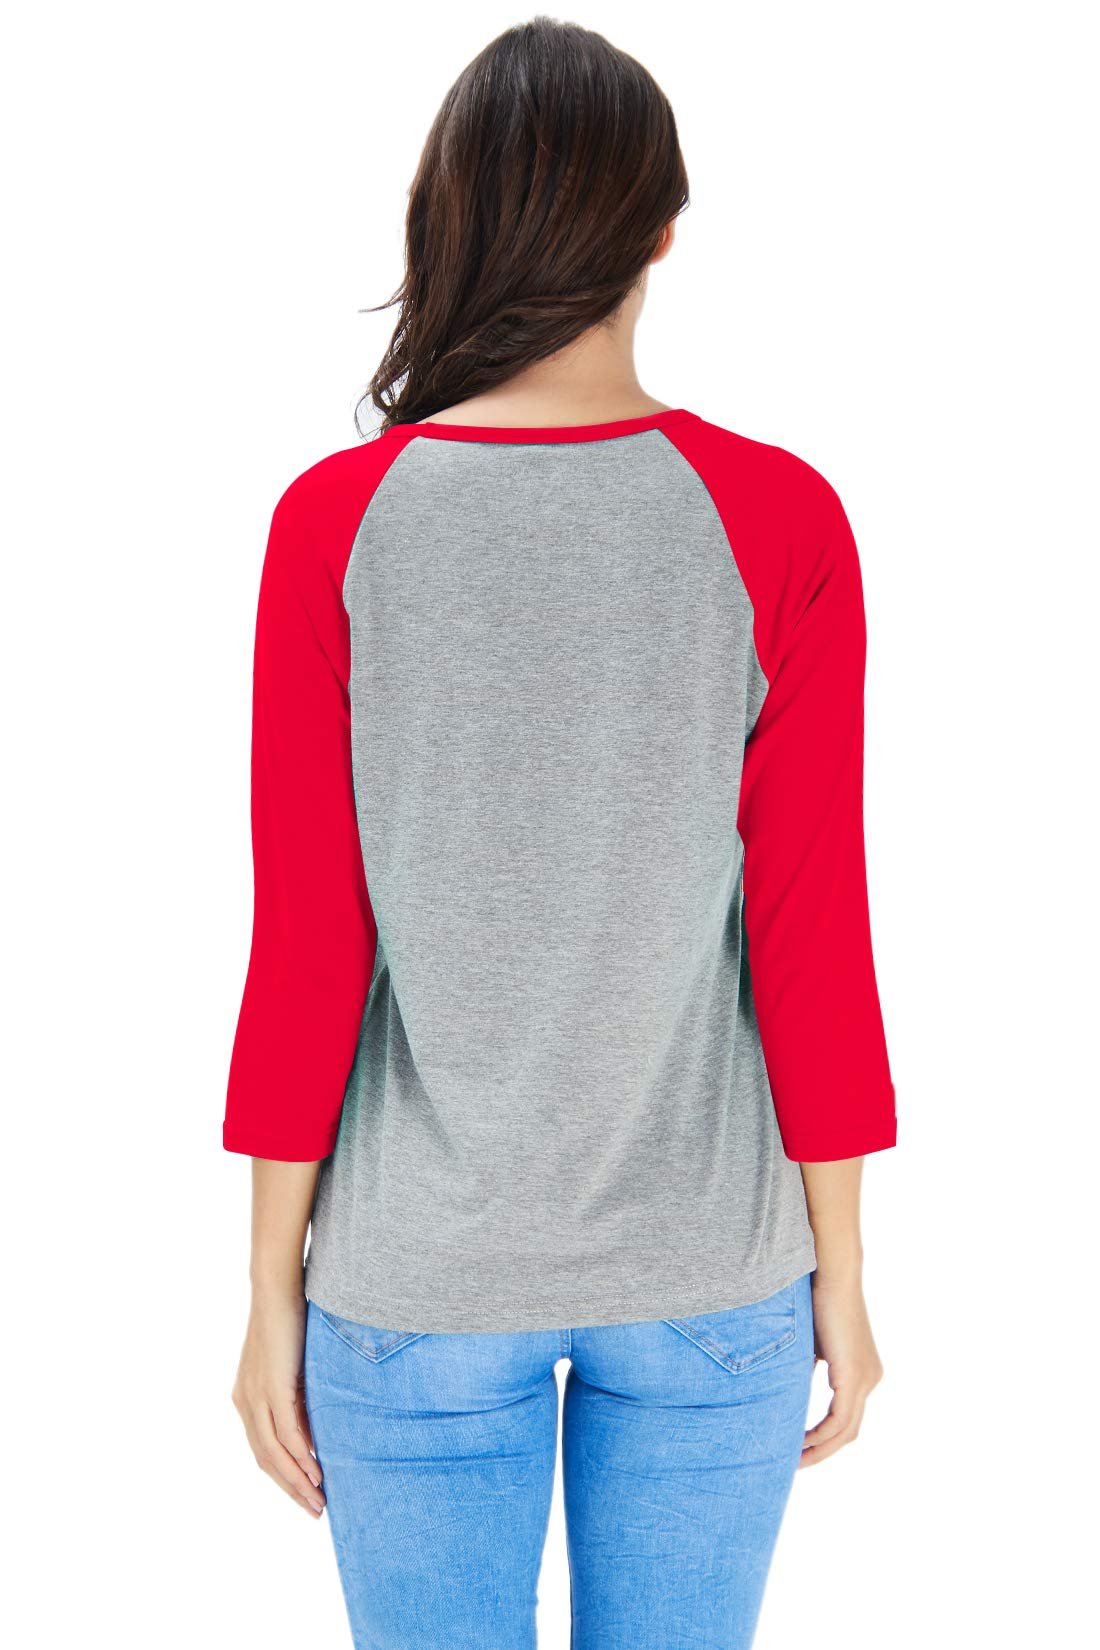 Goodstoworld Women Christian T-Shirt Women Raglan Long Sleeve Casual Holiday Party Blouse Tee Top